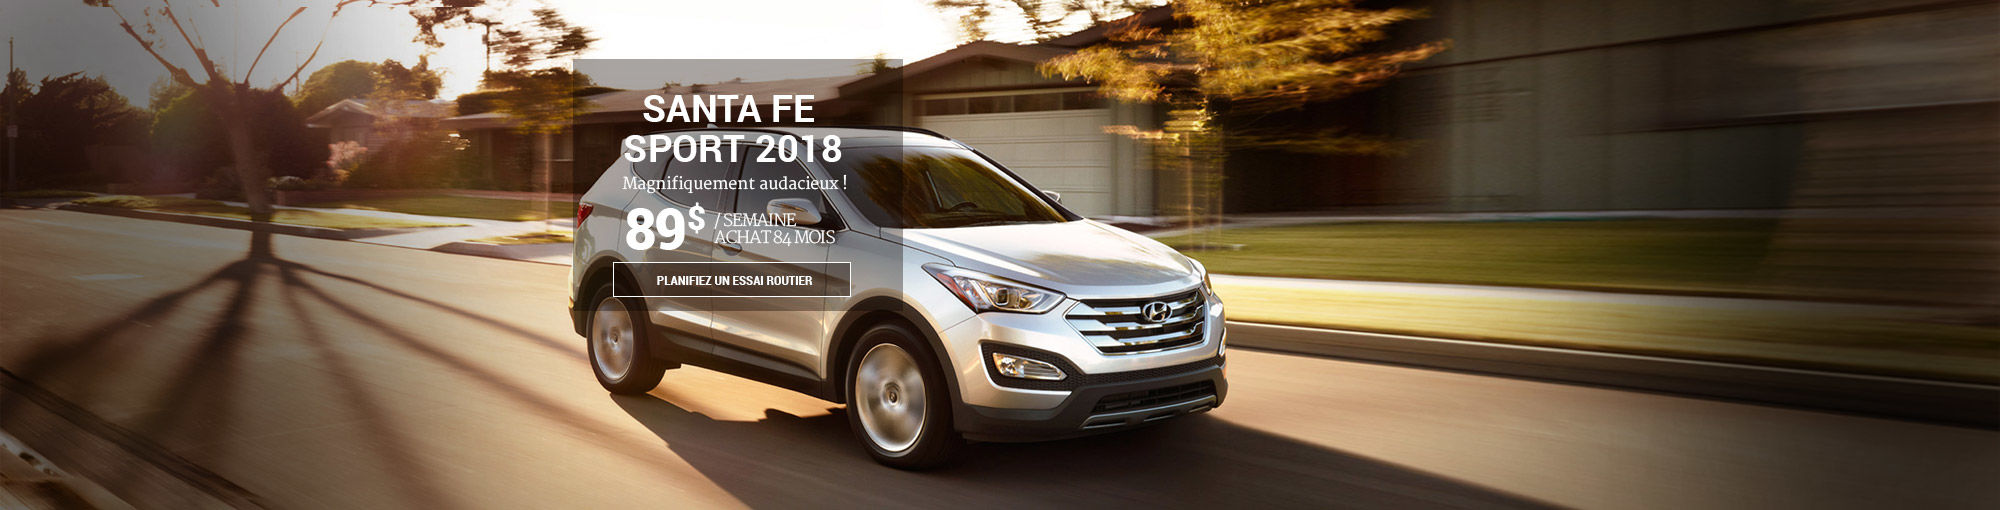 Hyundai Santa Fe Sport 2018 février